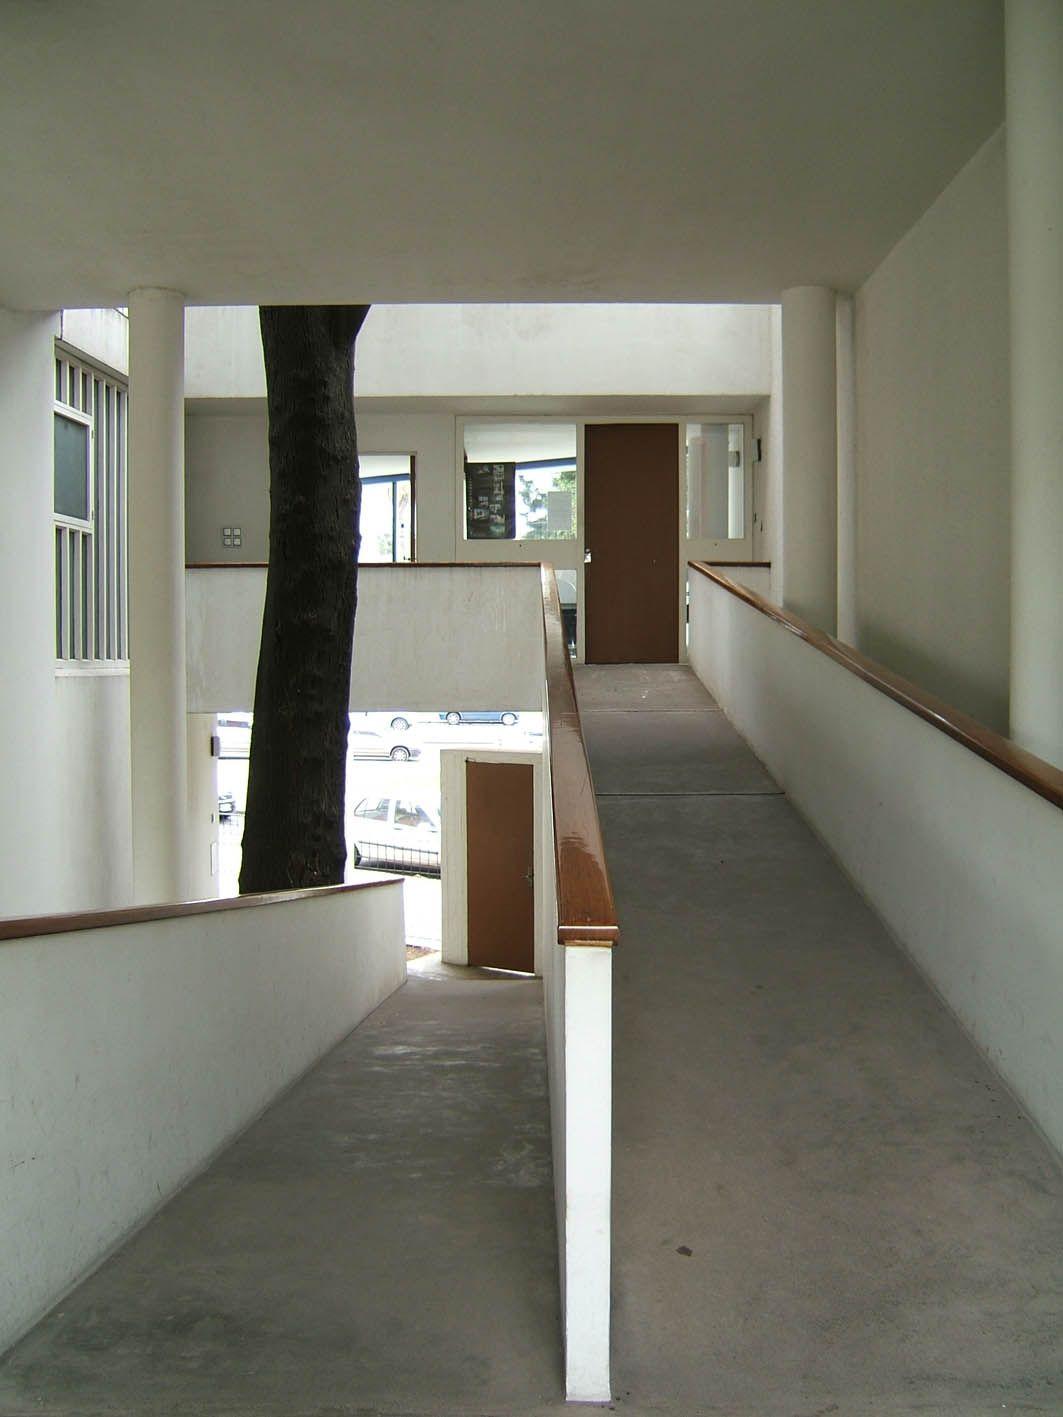 Arquitectura Casas Escaleras Exteriores Arquitectura: Casa Curutchet, Rampas Arquitectura Y Planos De Casas